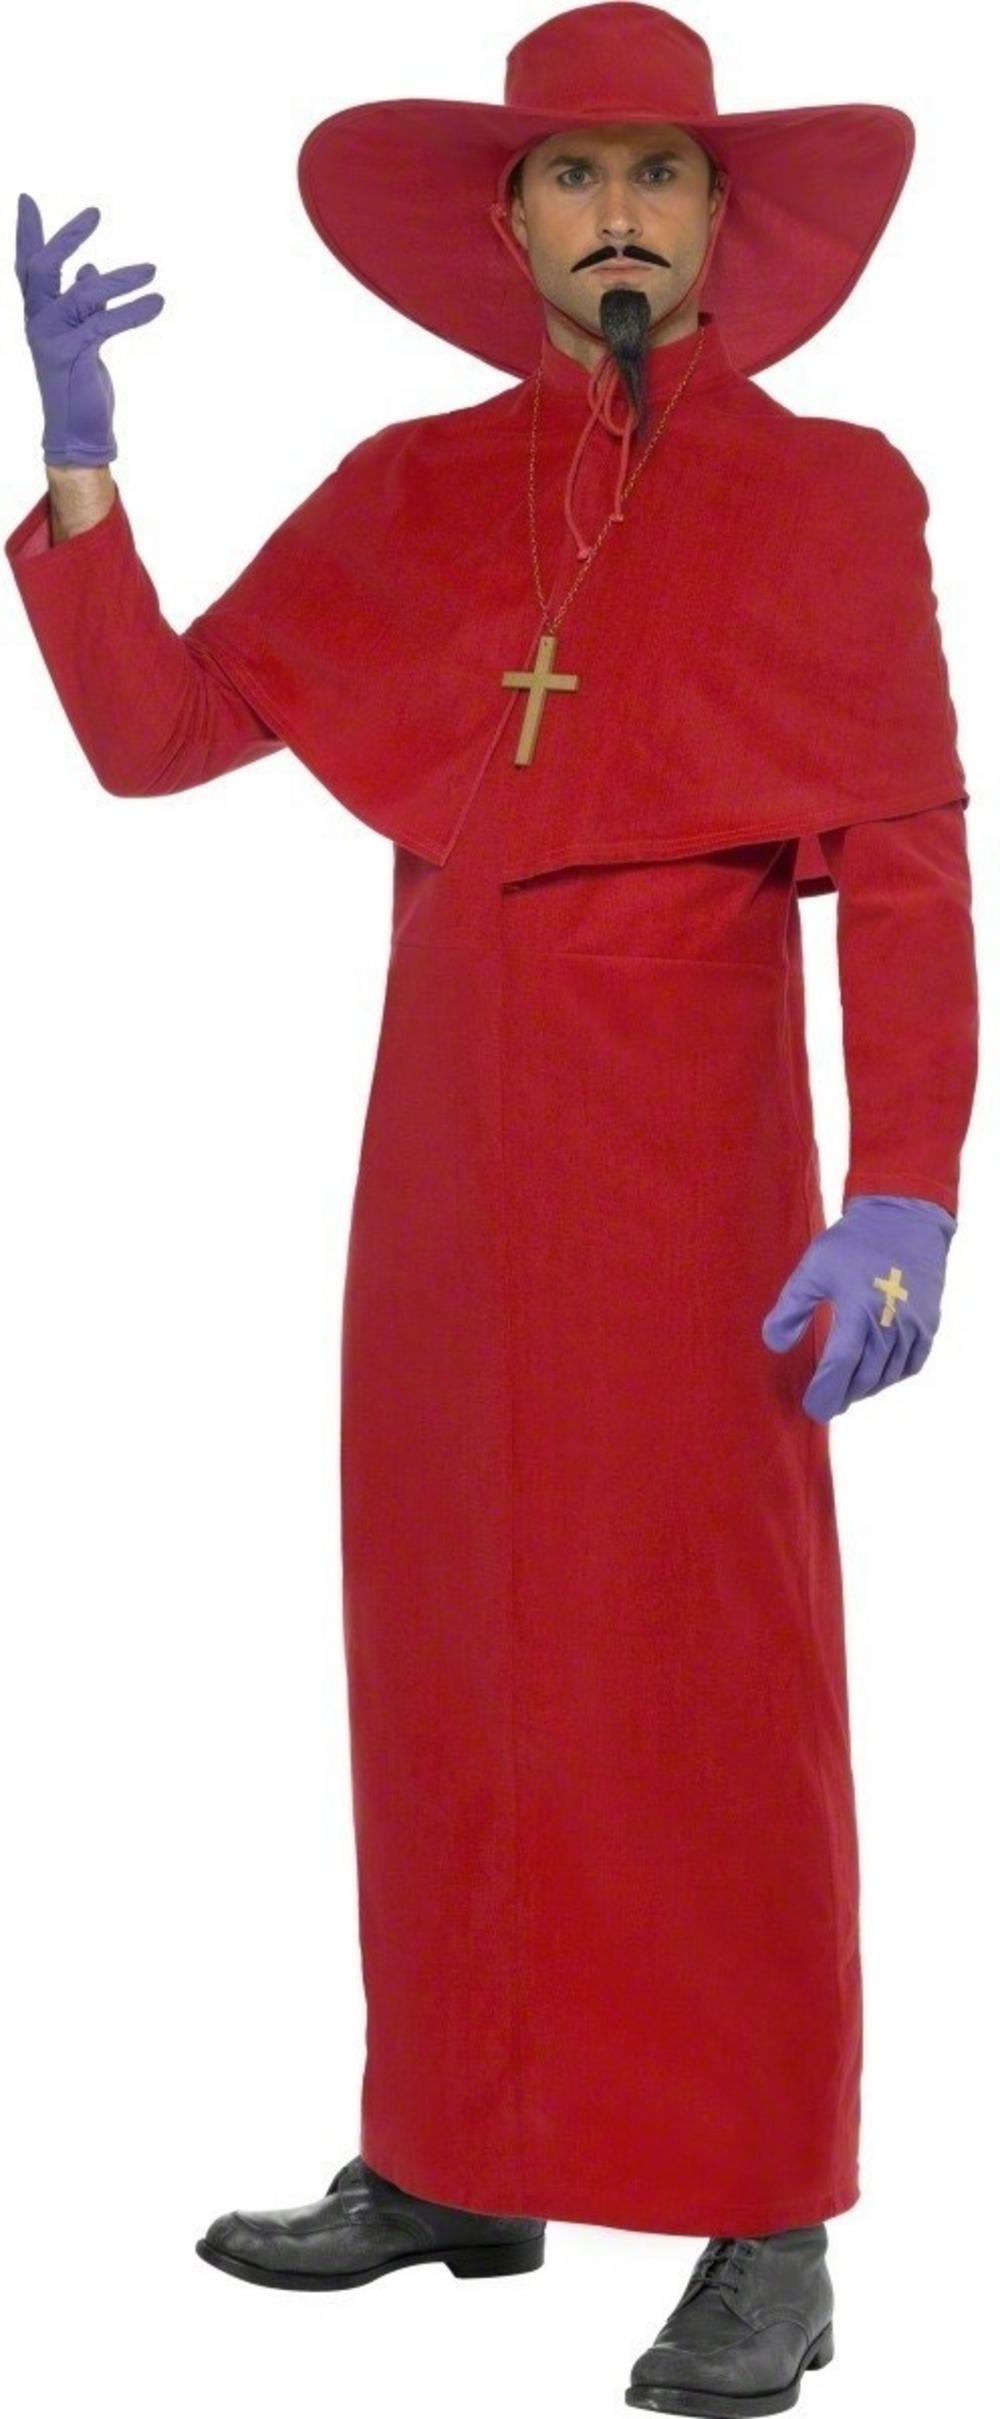 Monty Python Spanish Inquisition Costume